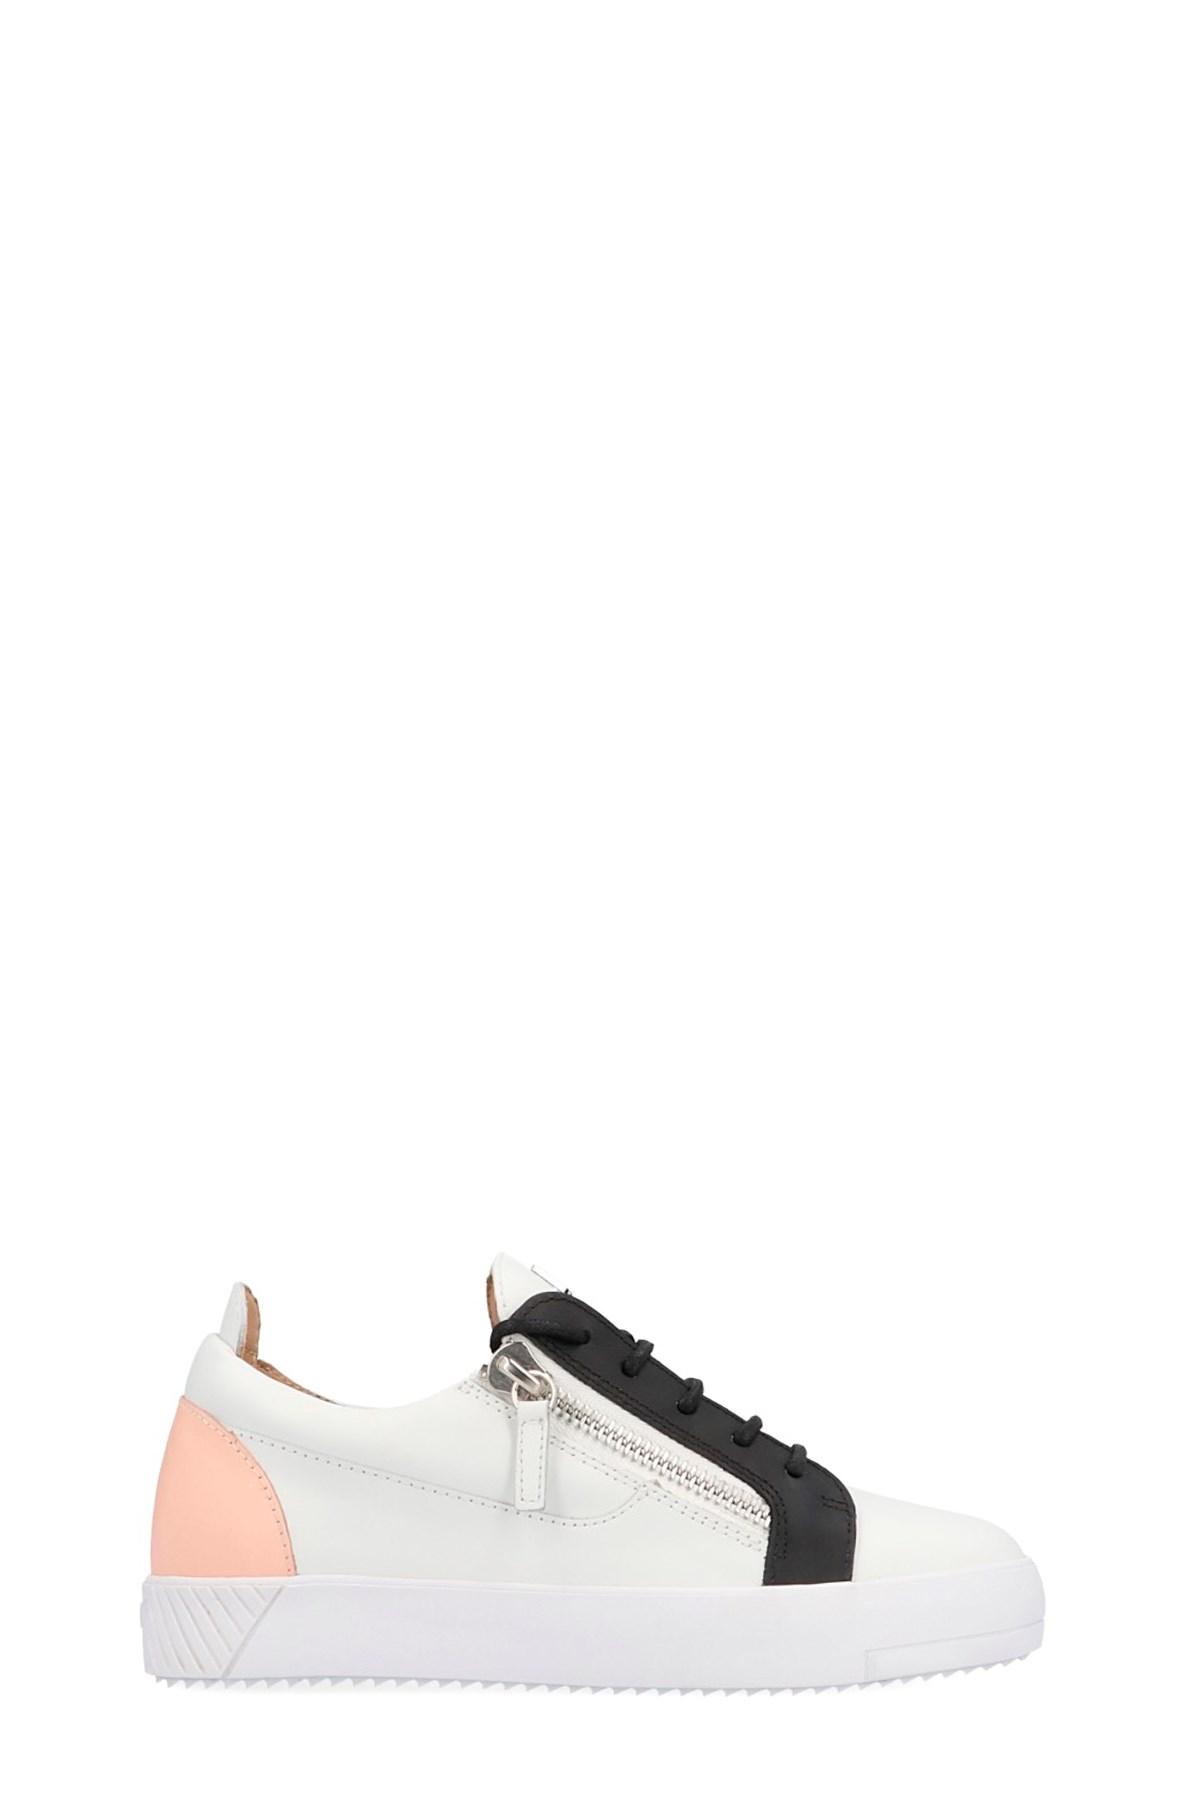 37e648308047e giuseppe zanotti 'July' sneakers available on julian-fashion.com - 66214